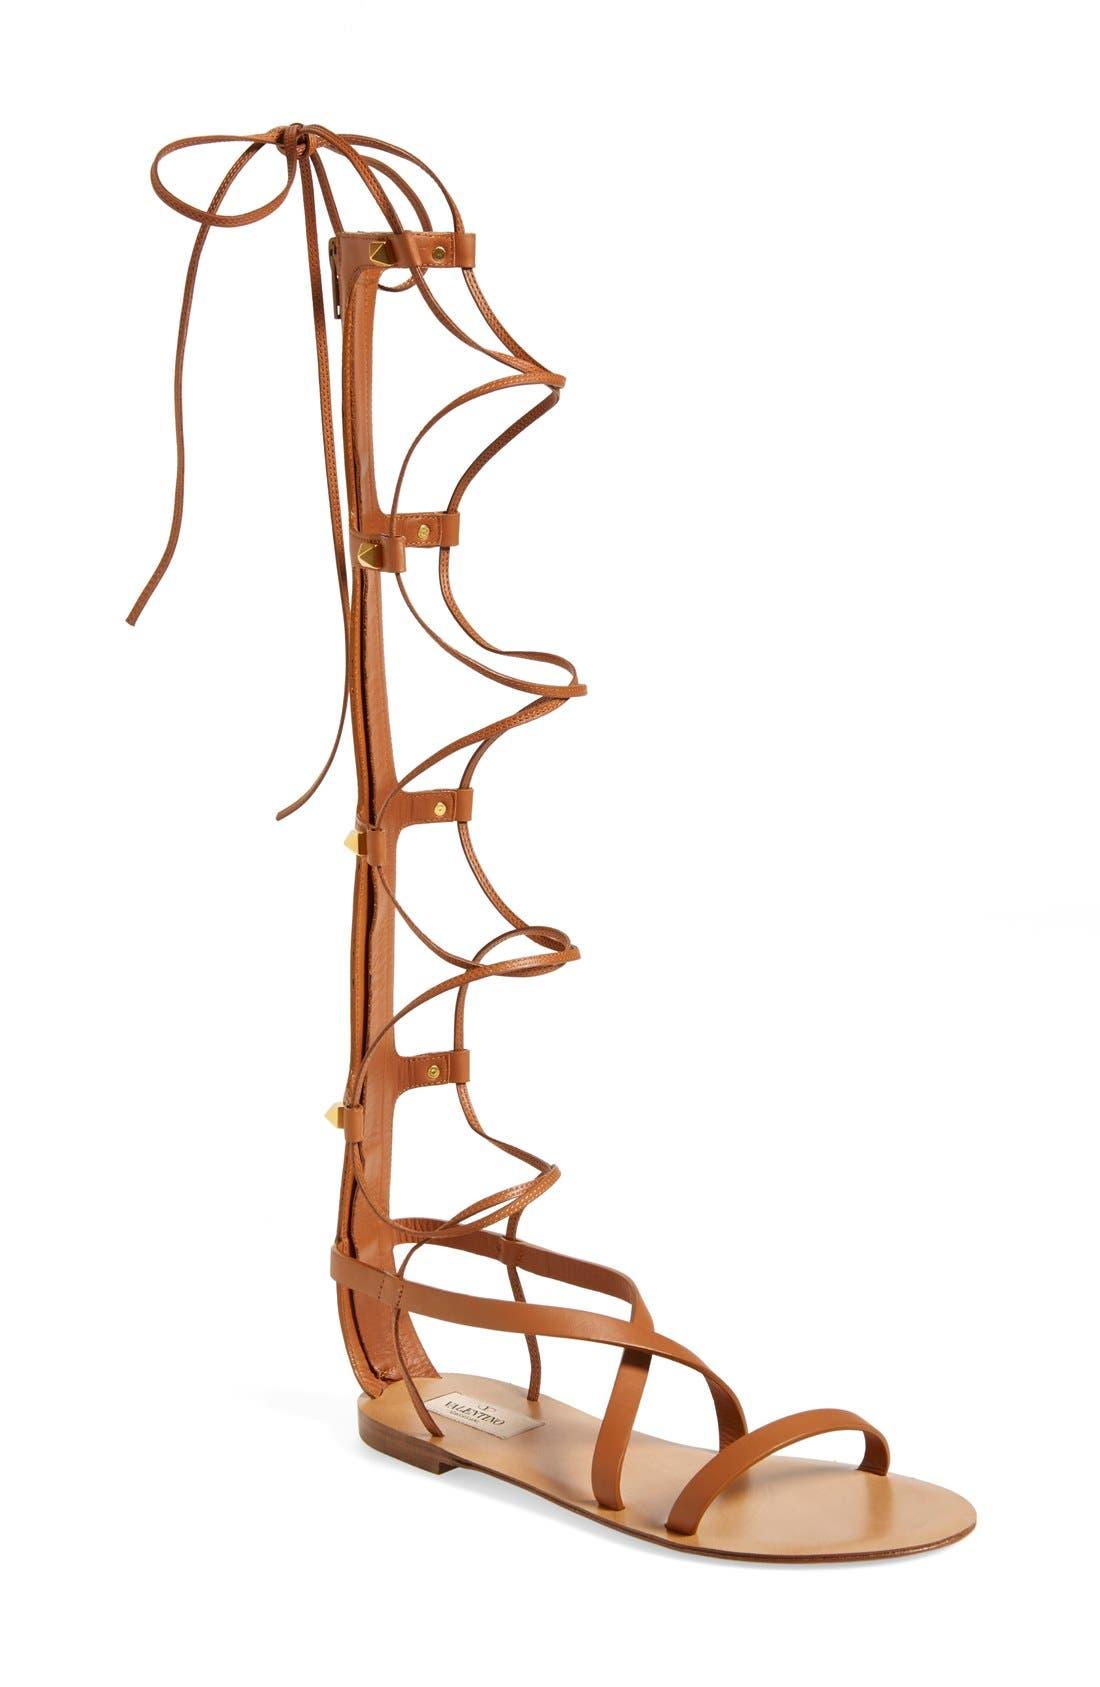 Alternate Image 1 Selected - VALENTINO GARAVANI 'Rockstud' Tall Gladiator Sandal (Women)